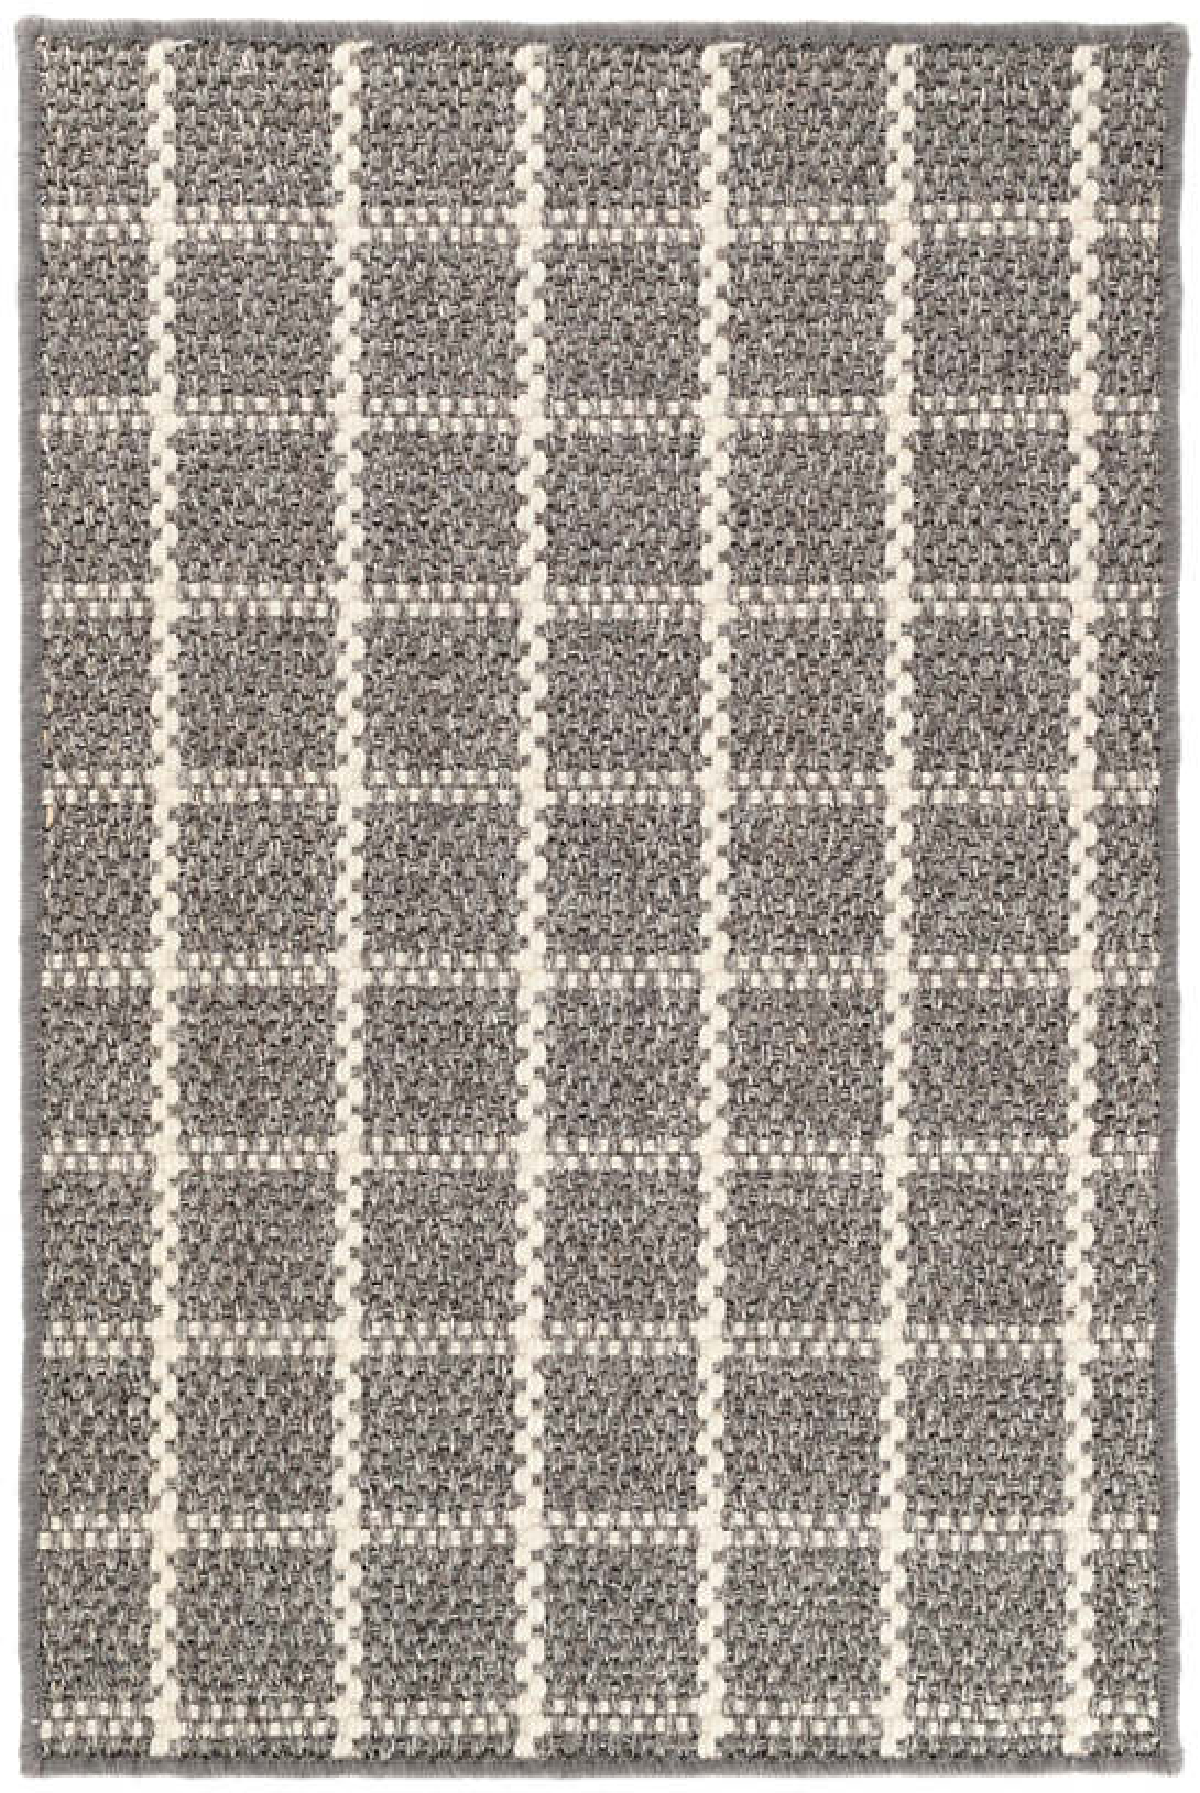 Framework Grey Woven Sisal Rug